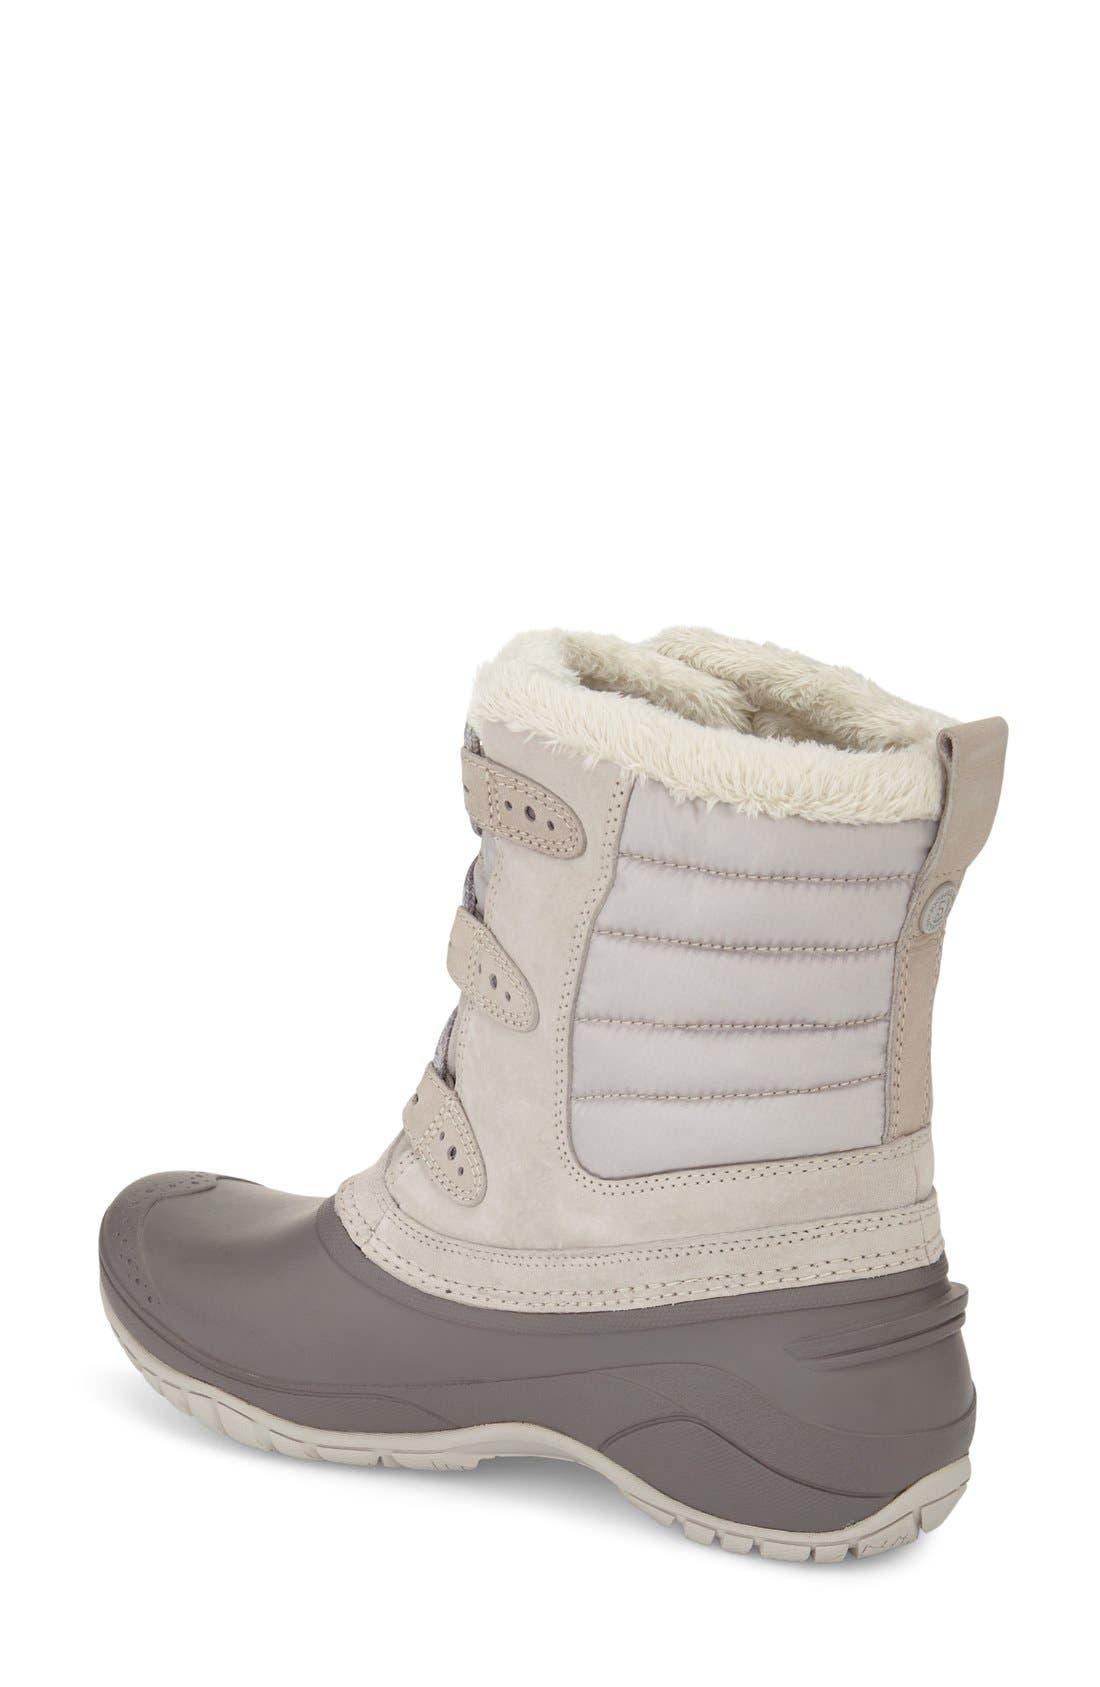 Shellista II Waterproof Boot,                             Alternate thumbnail 12, color,